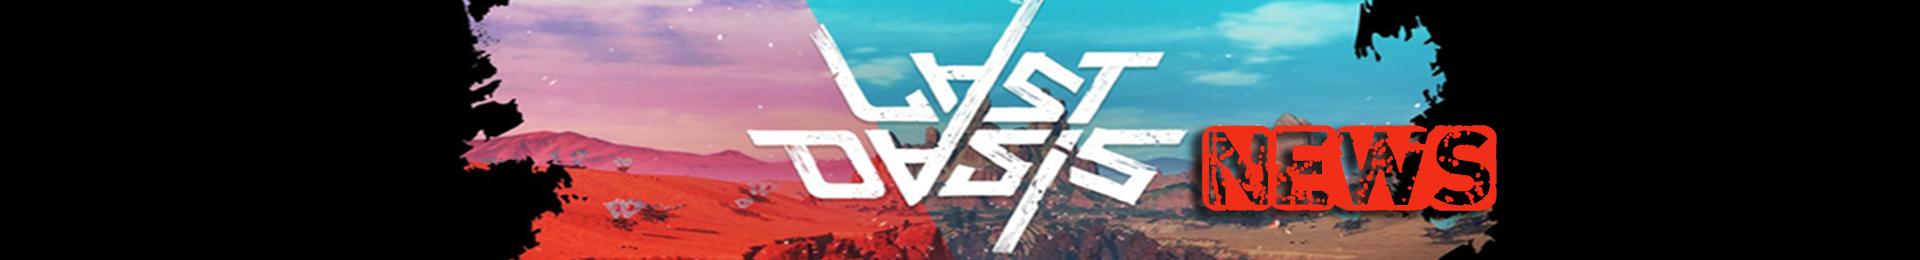 lastoasisnews.png